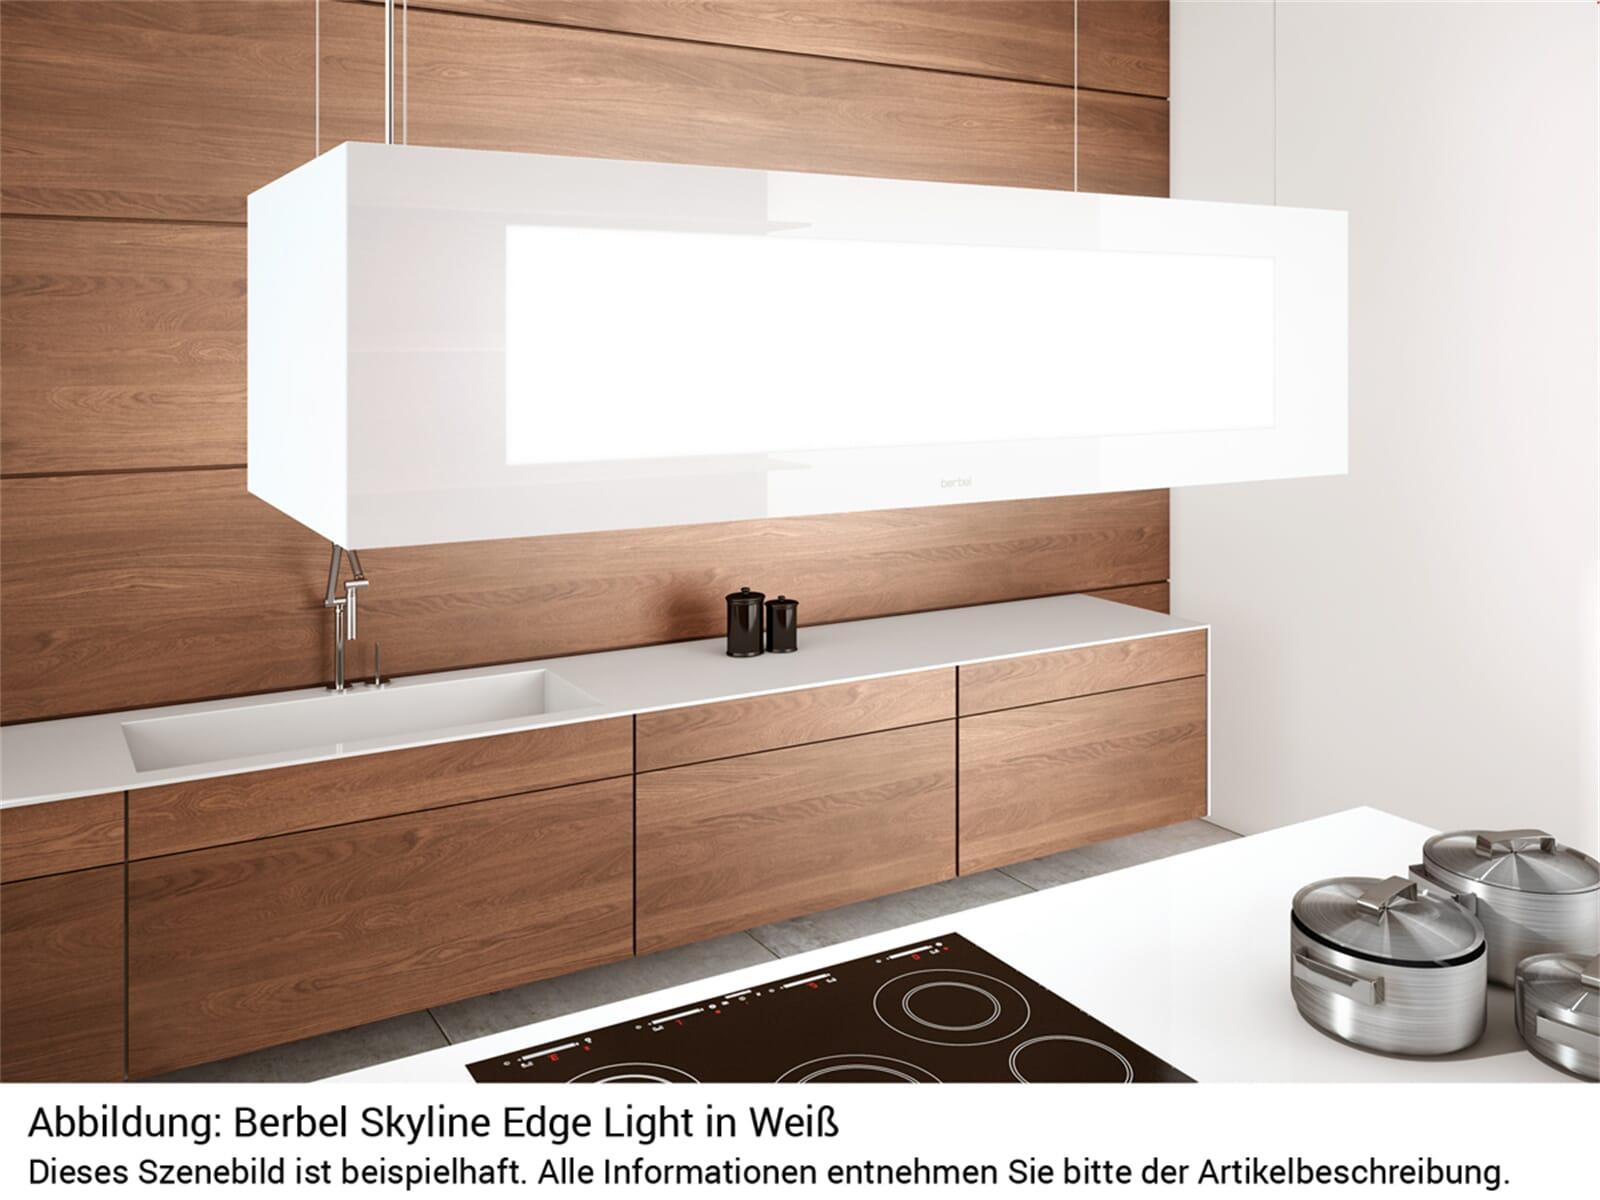 Berbel Skyline Edge Light BDL 95 SKE-L Deckenlifthaube Weiß